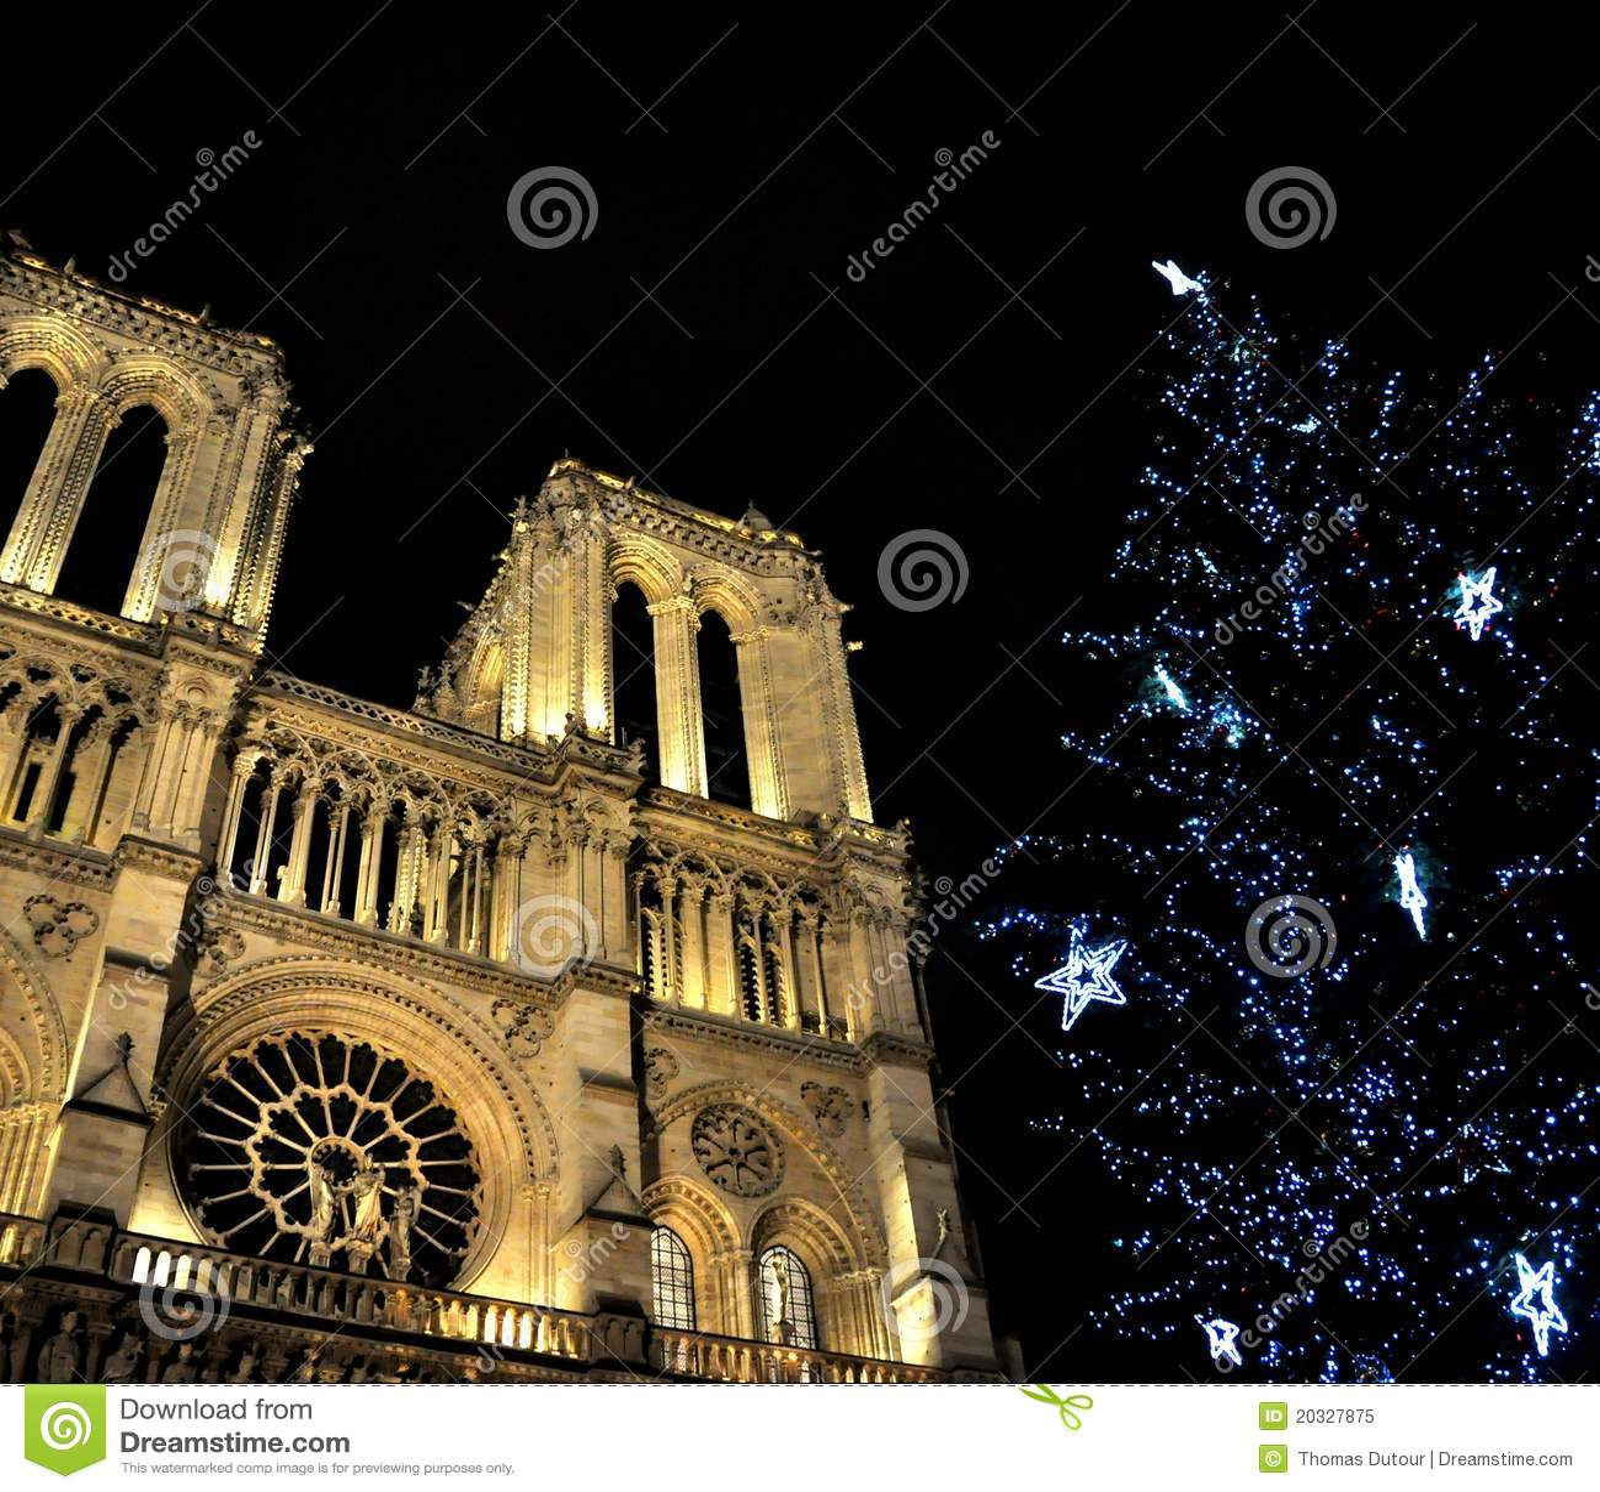 Notre-Dame De Paris At Christmas Stock Image - Image of catholicism ...